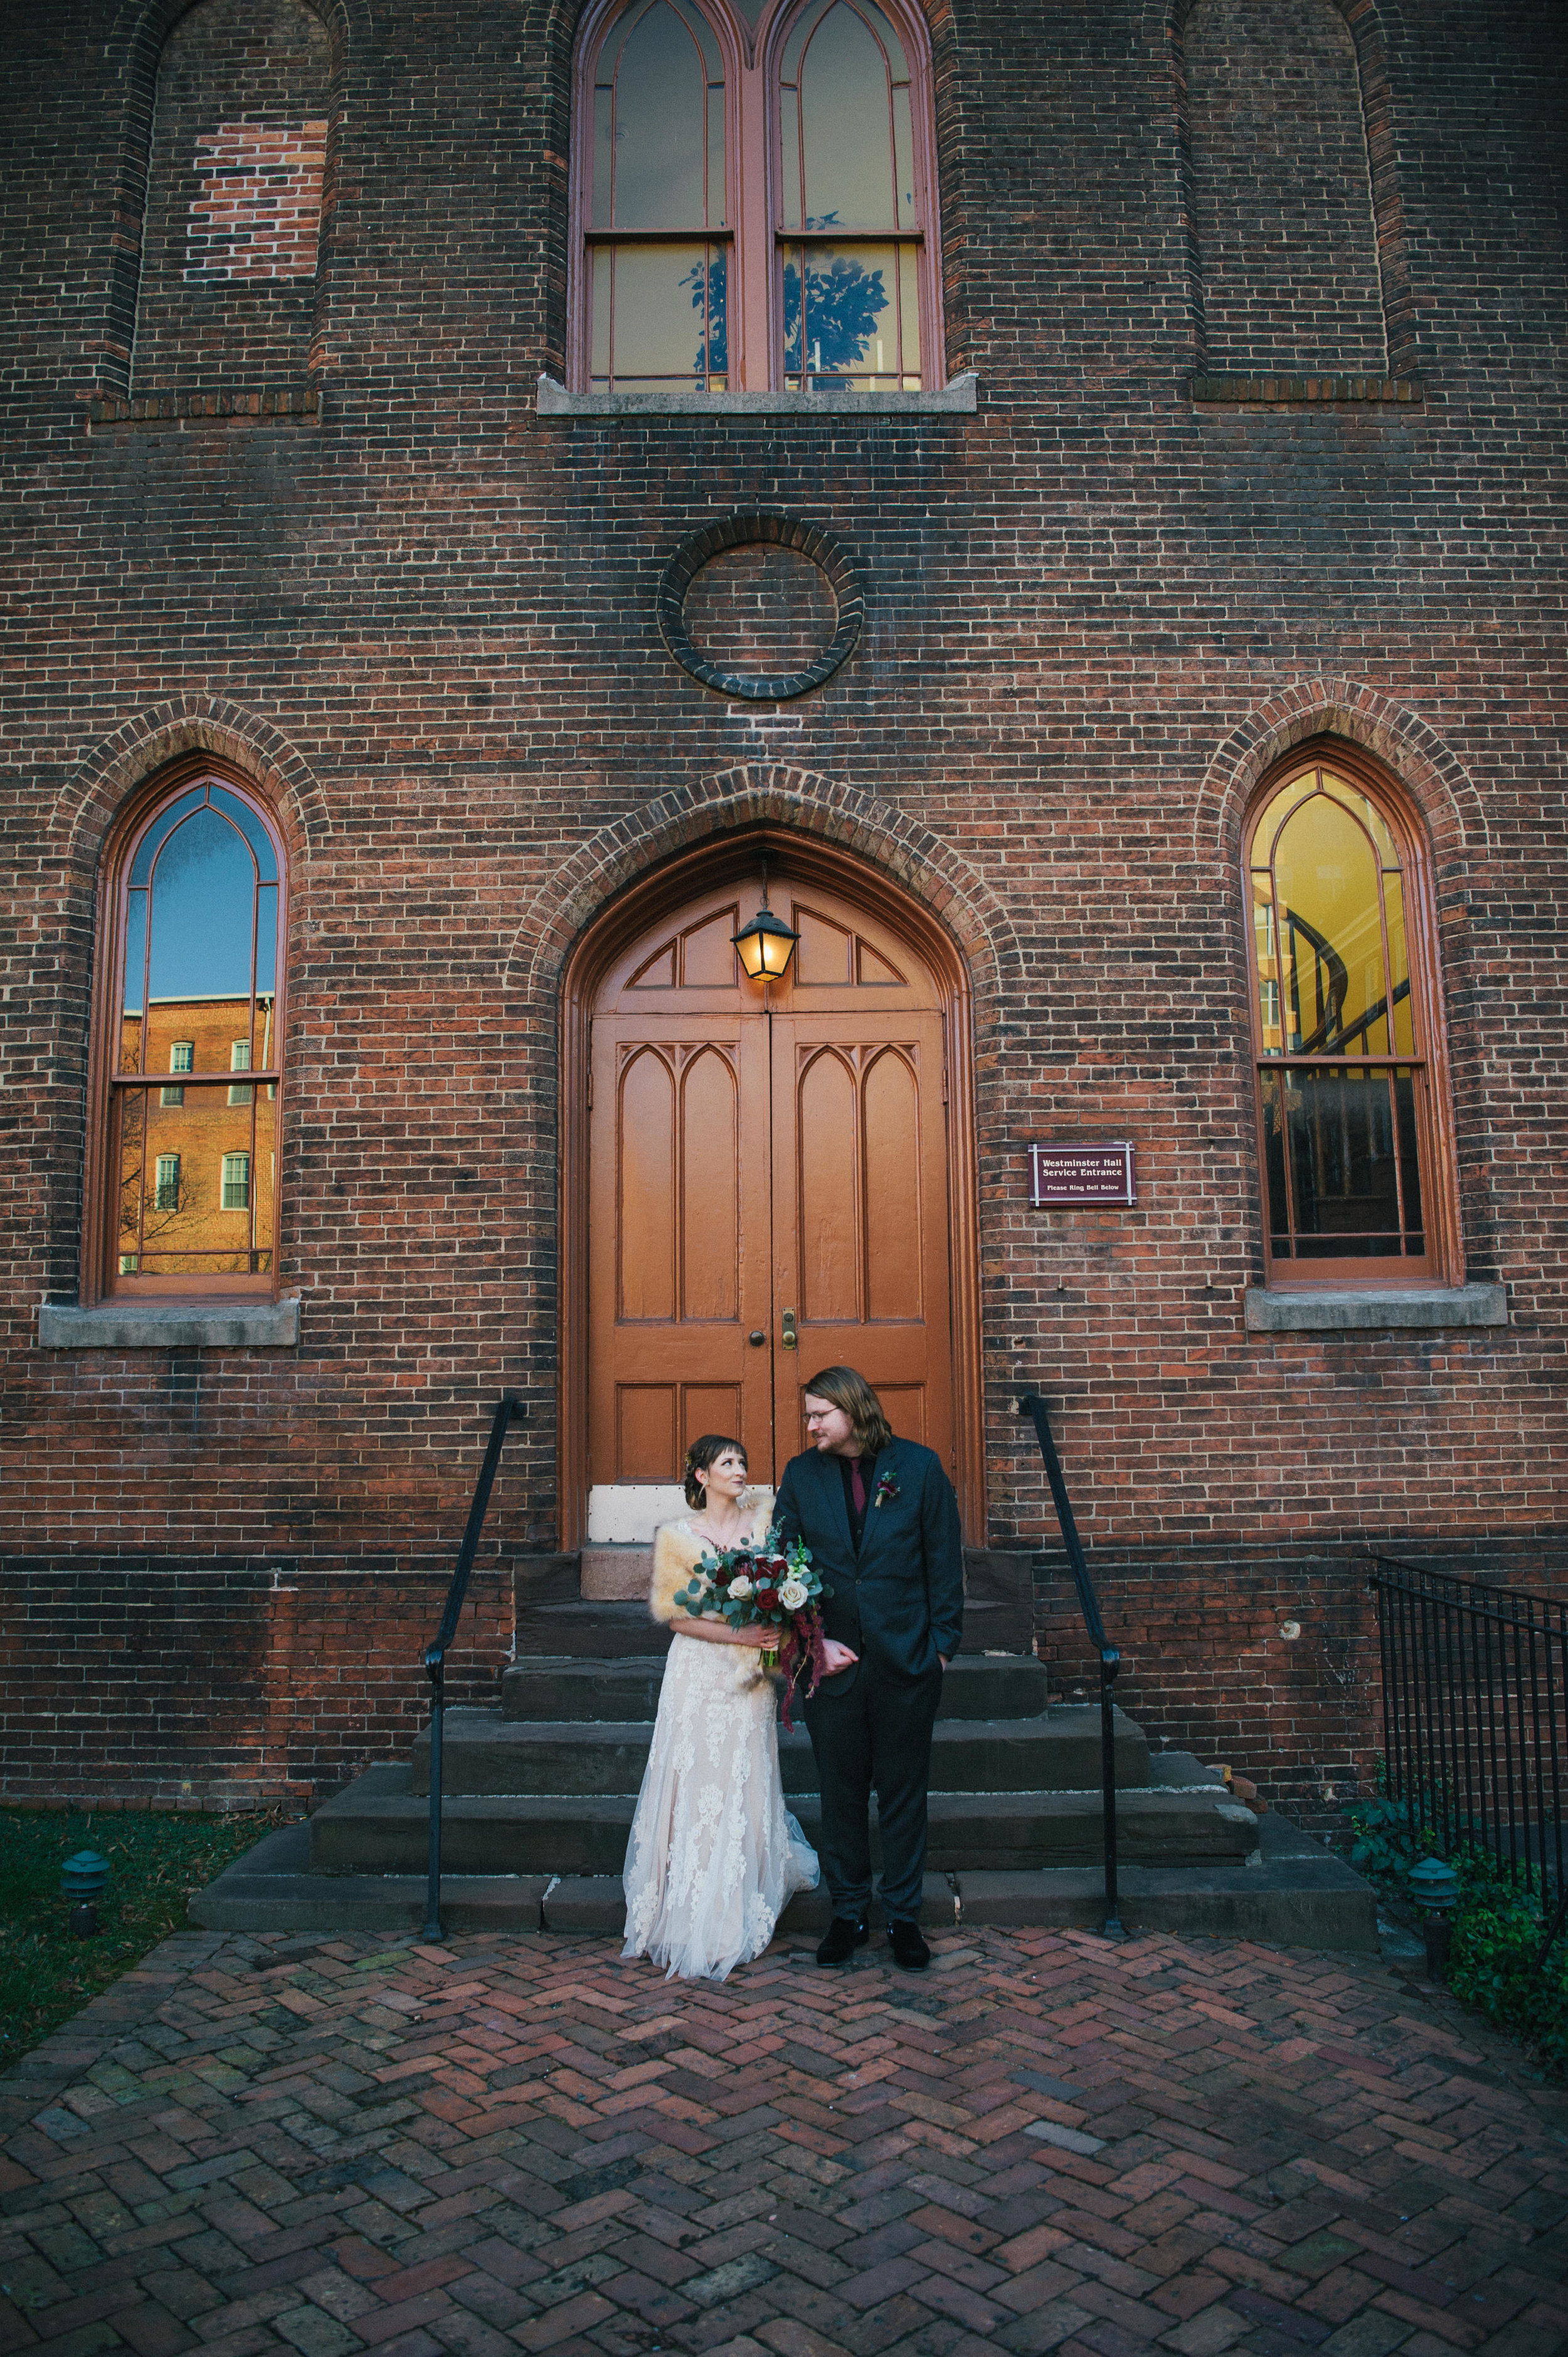 Amber and Kyles Wedding 36.jpg